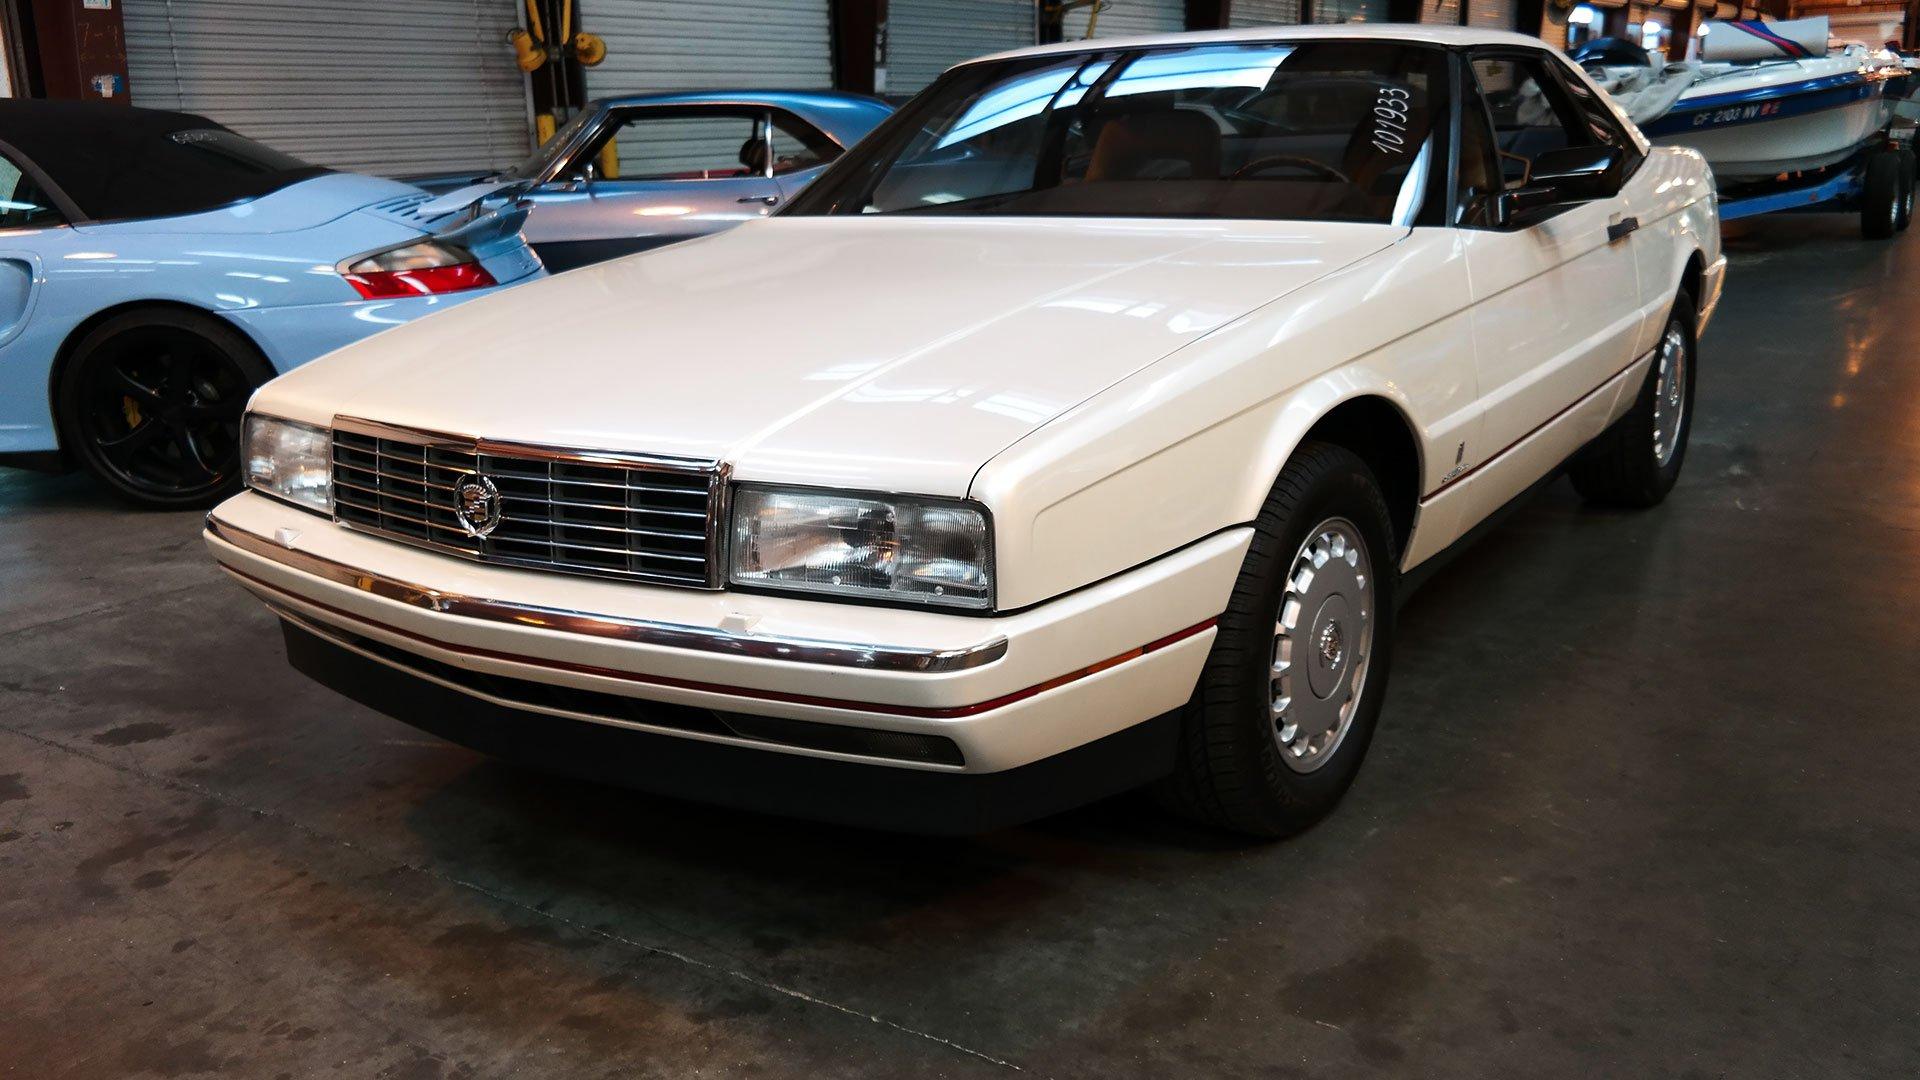 Cadillac-Allante-usa-classic-car.jpg